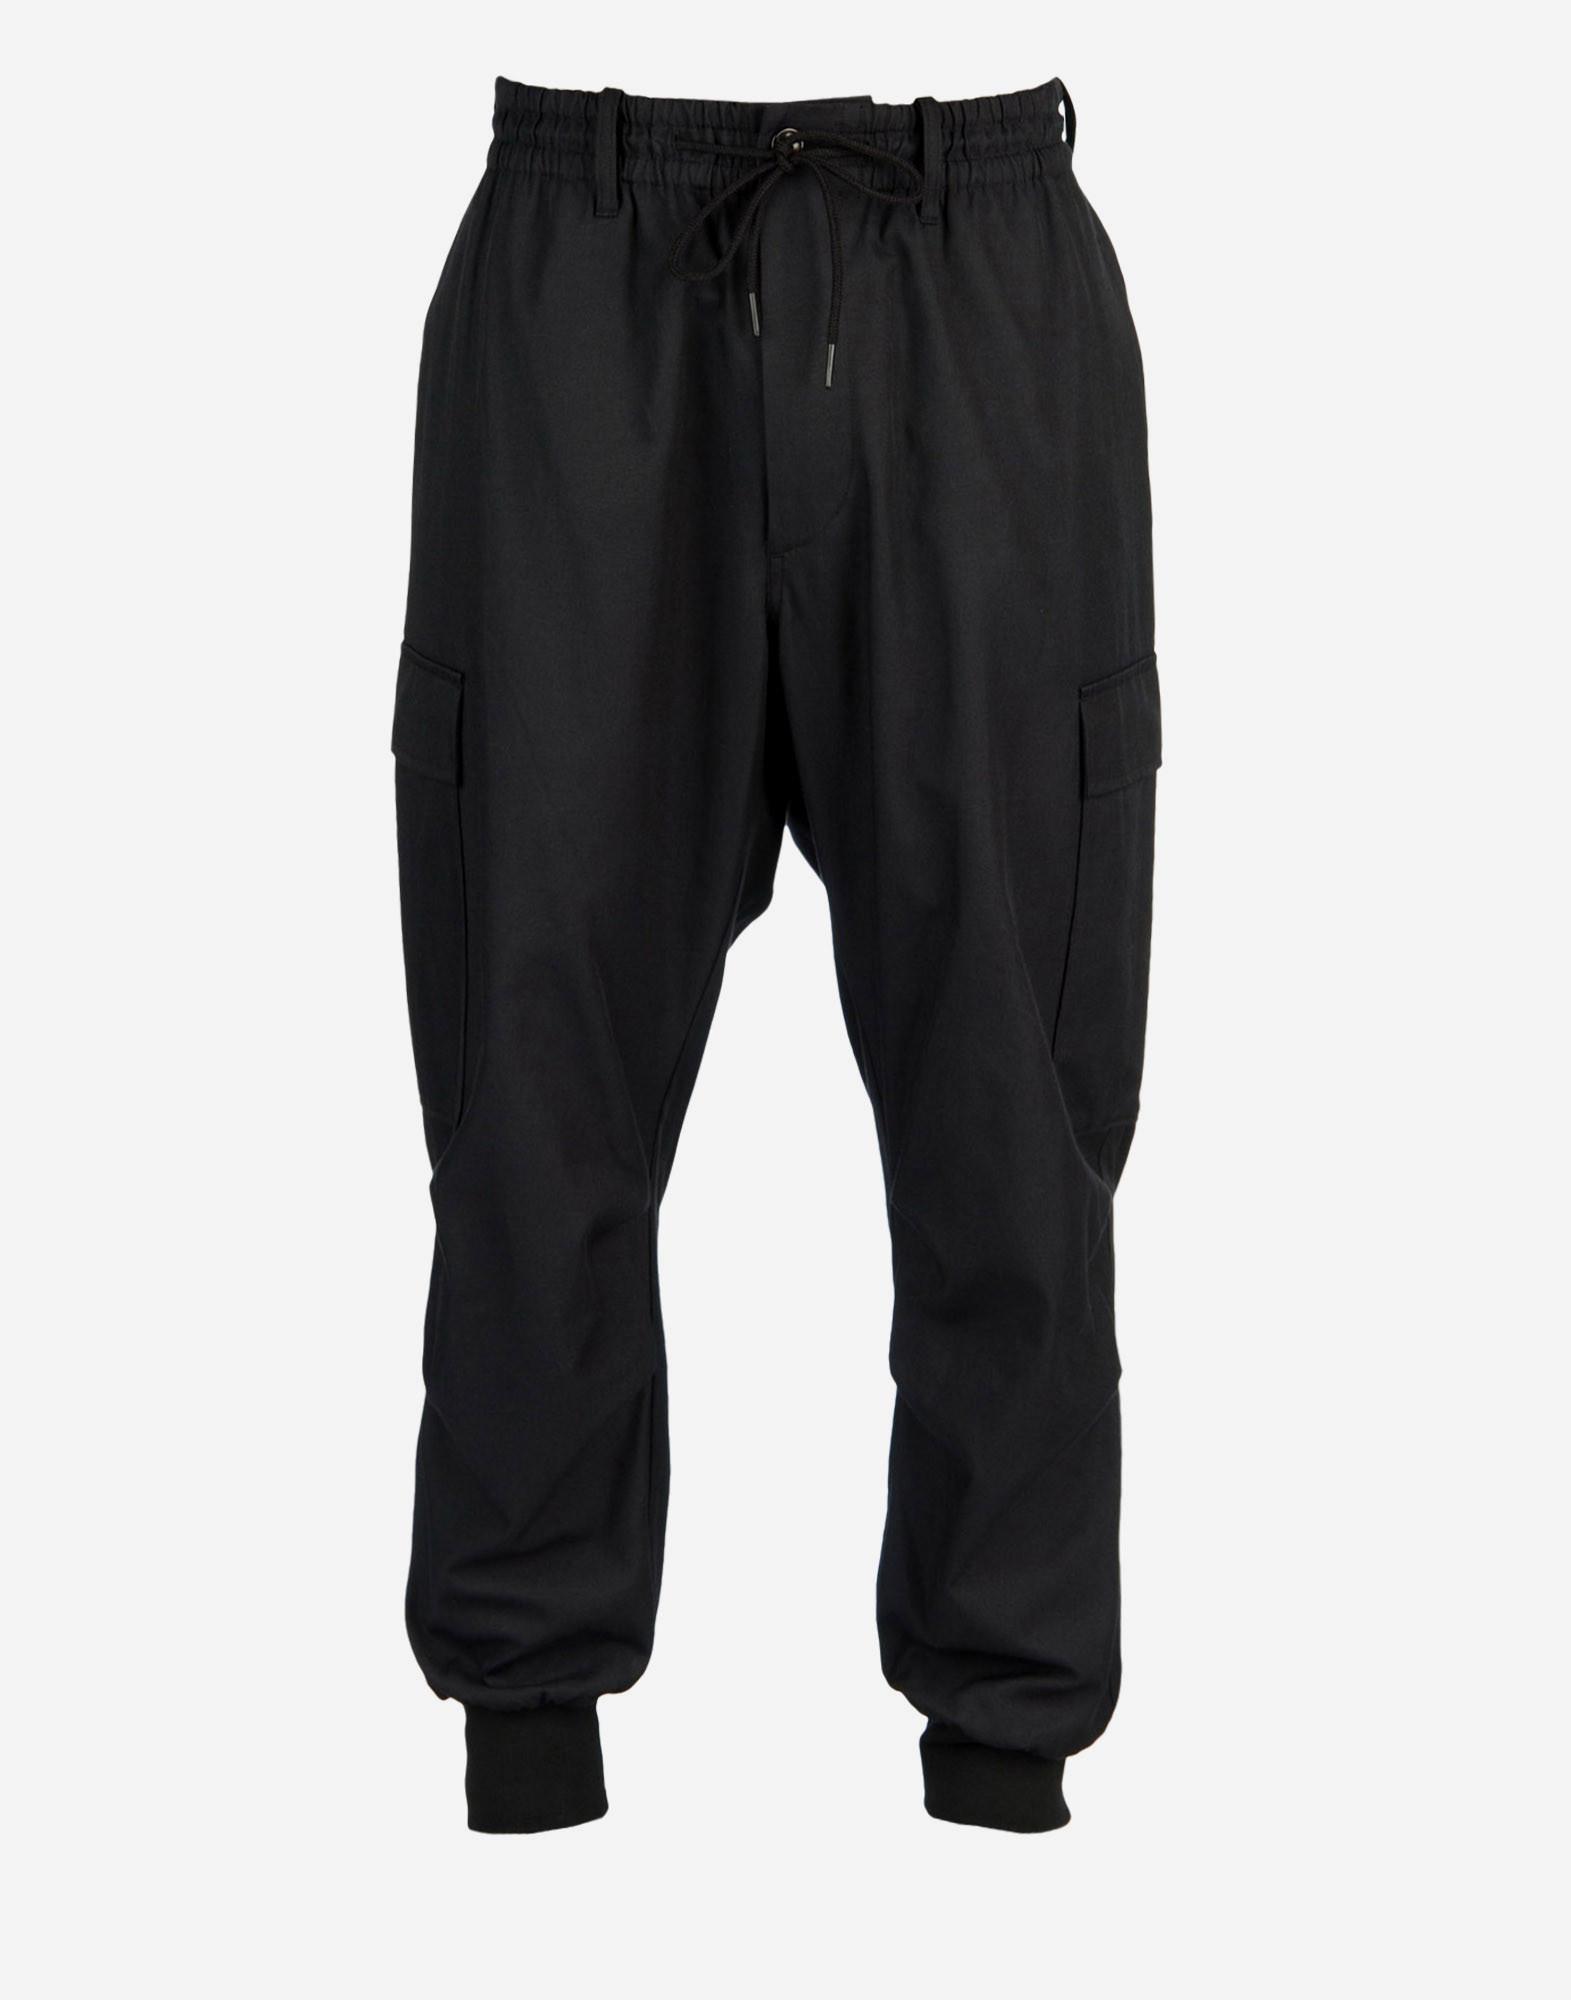 y-3 parachute pants pants man y-3 adidas gxtnyyv